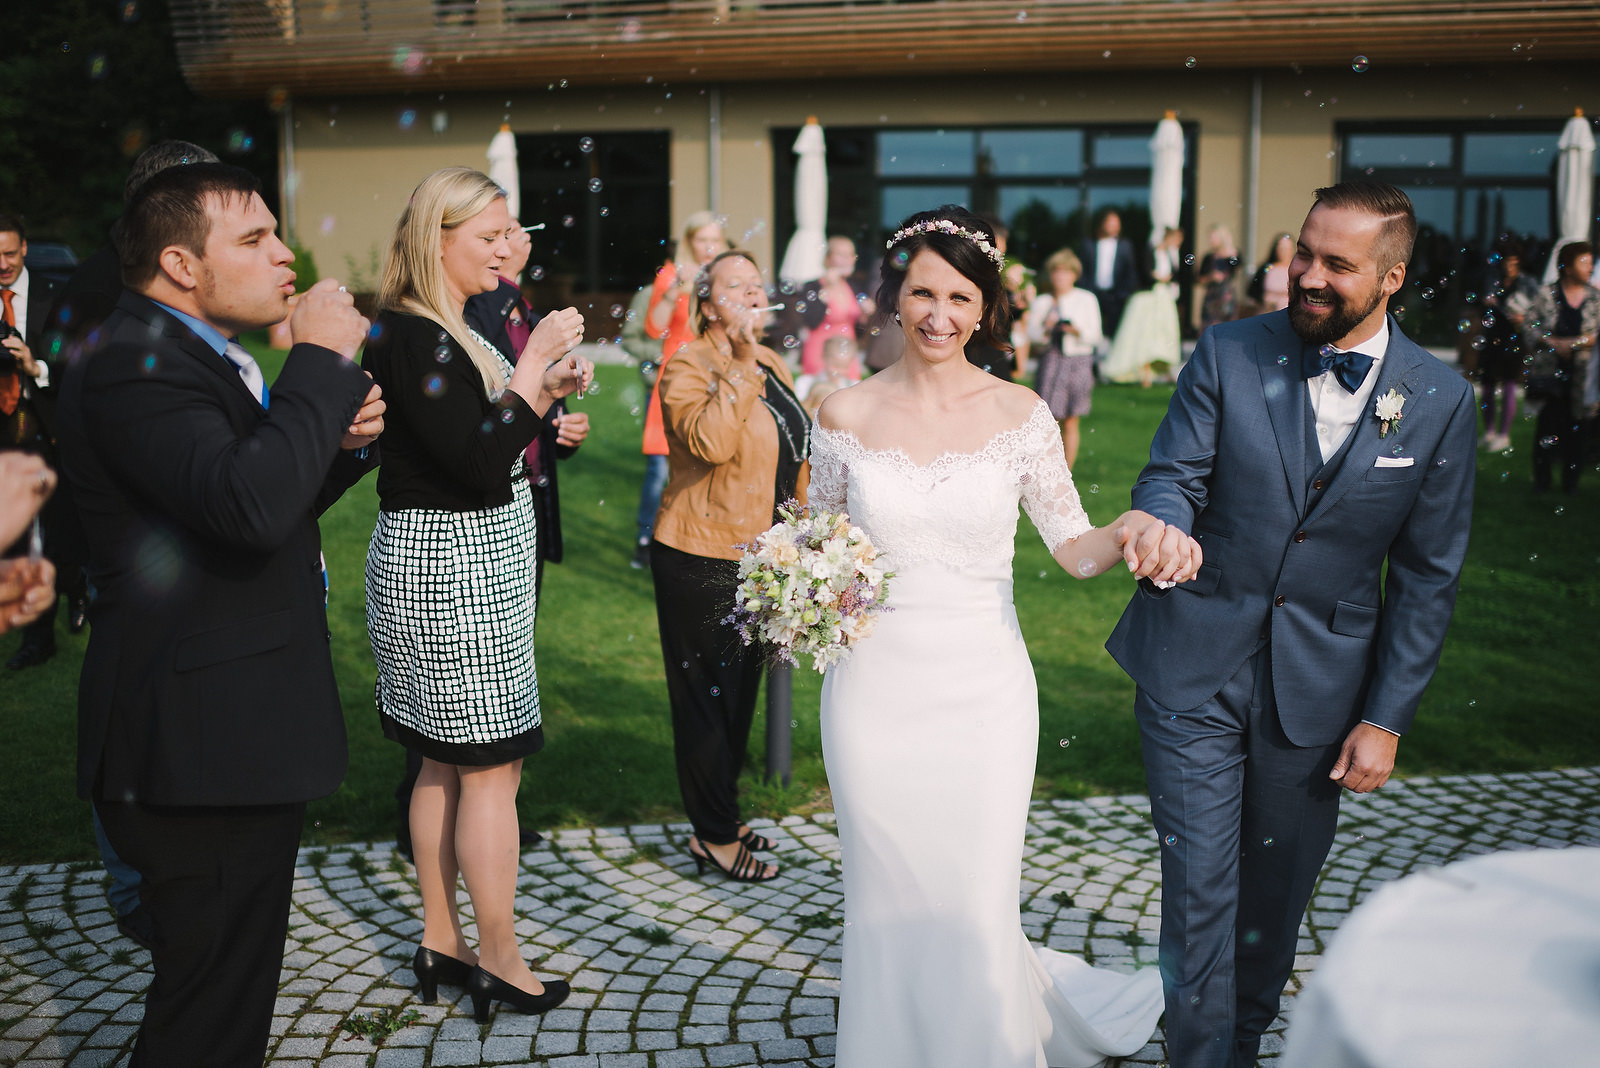 Fotograf Konstanz - Hochzeitsfotograf Reutlingen Achalm Hochzeit EFP 62 - Als Hochzeitsfotograf auf der Achalm, Reutlingen  - 50 -